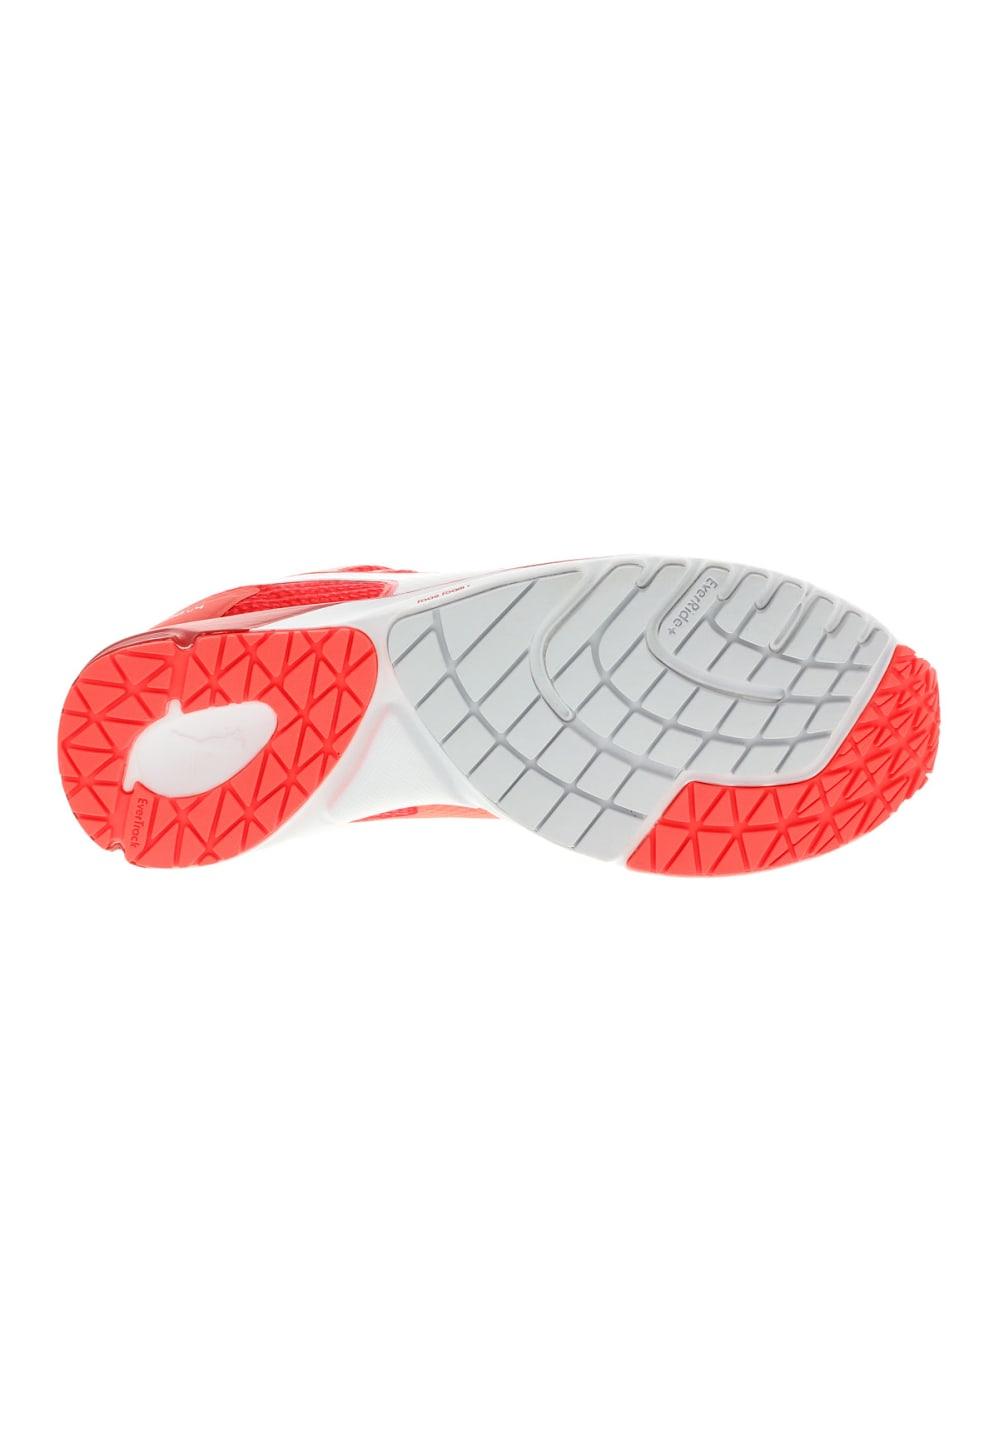 e5b9d1c8aba9 Puma Faas 300 v4 - Chaussures running pour Femme - Rouge | 21RUN